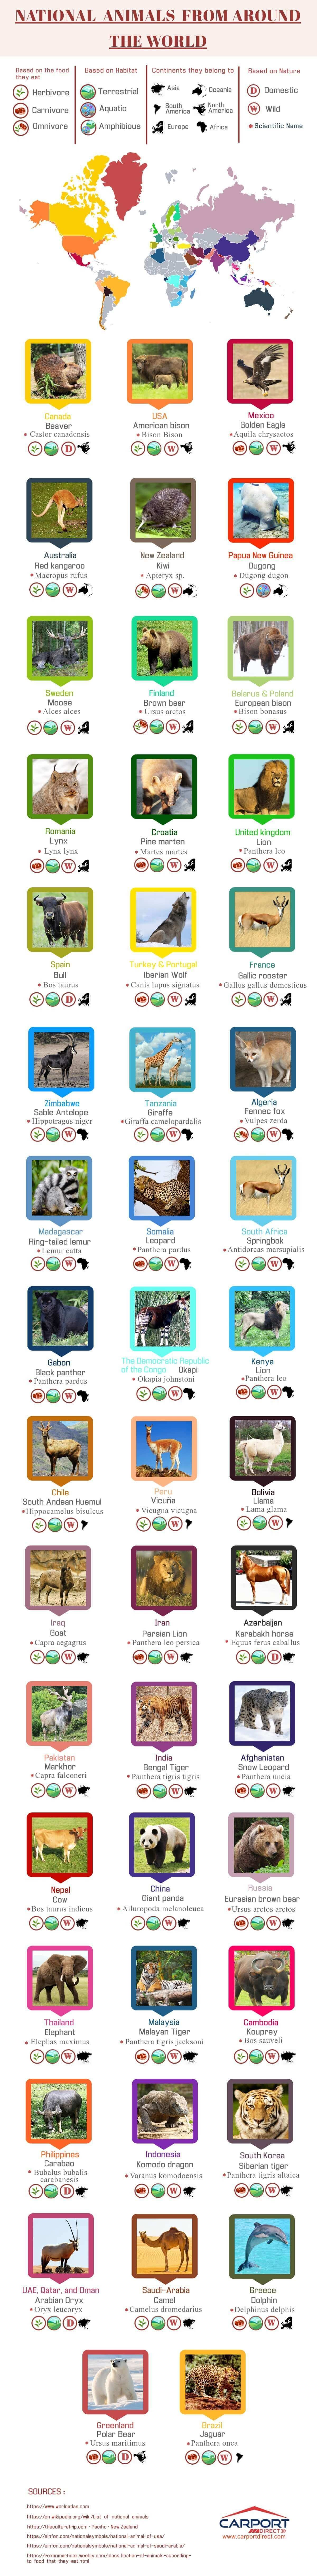 National Animals from Around the World #infographic